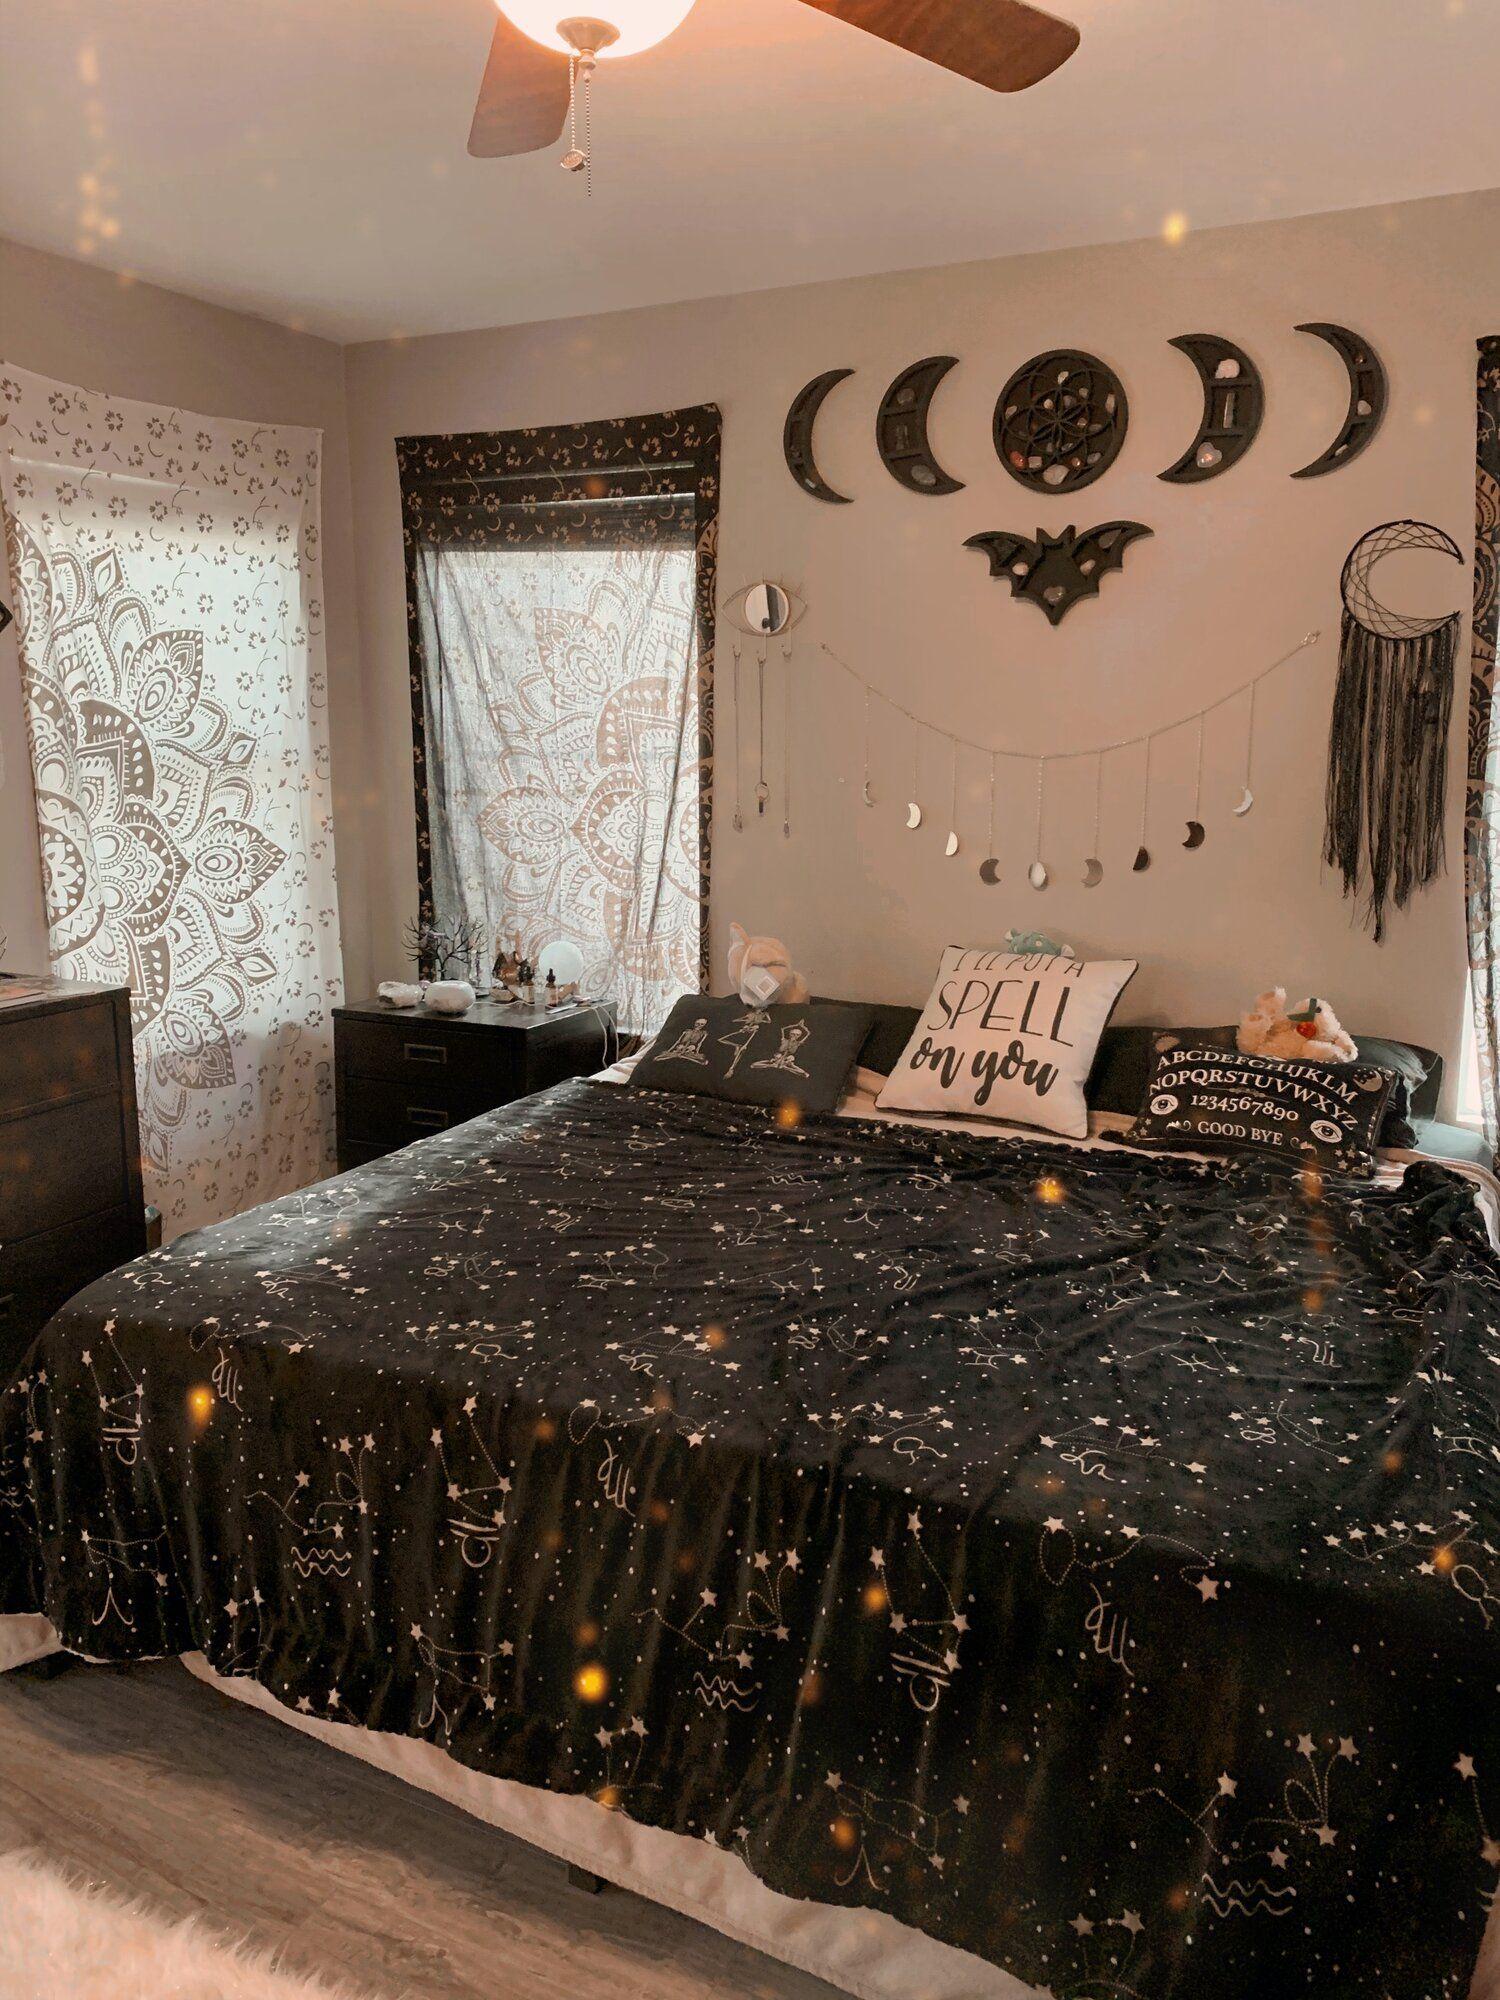 Идеи на тему «My room» 21 в 21 г   крутые комнаты, комнаты ...